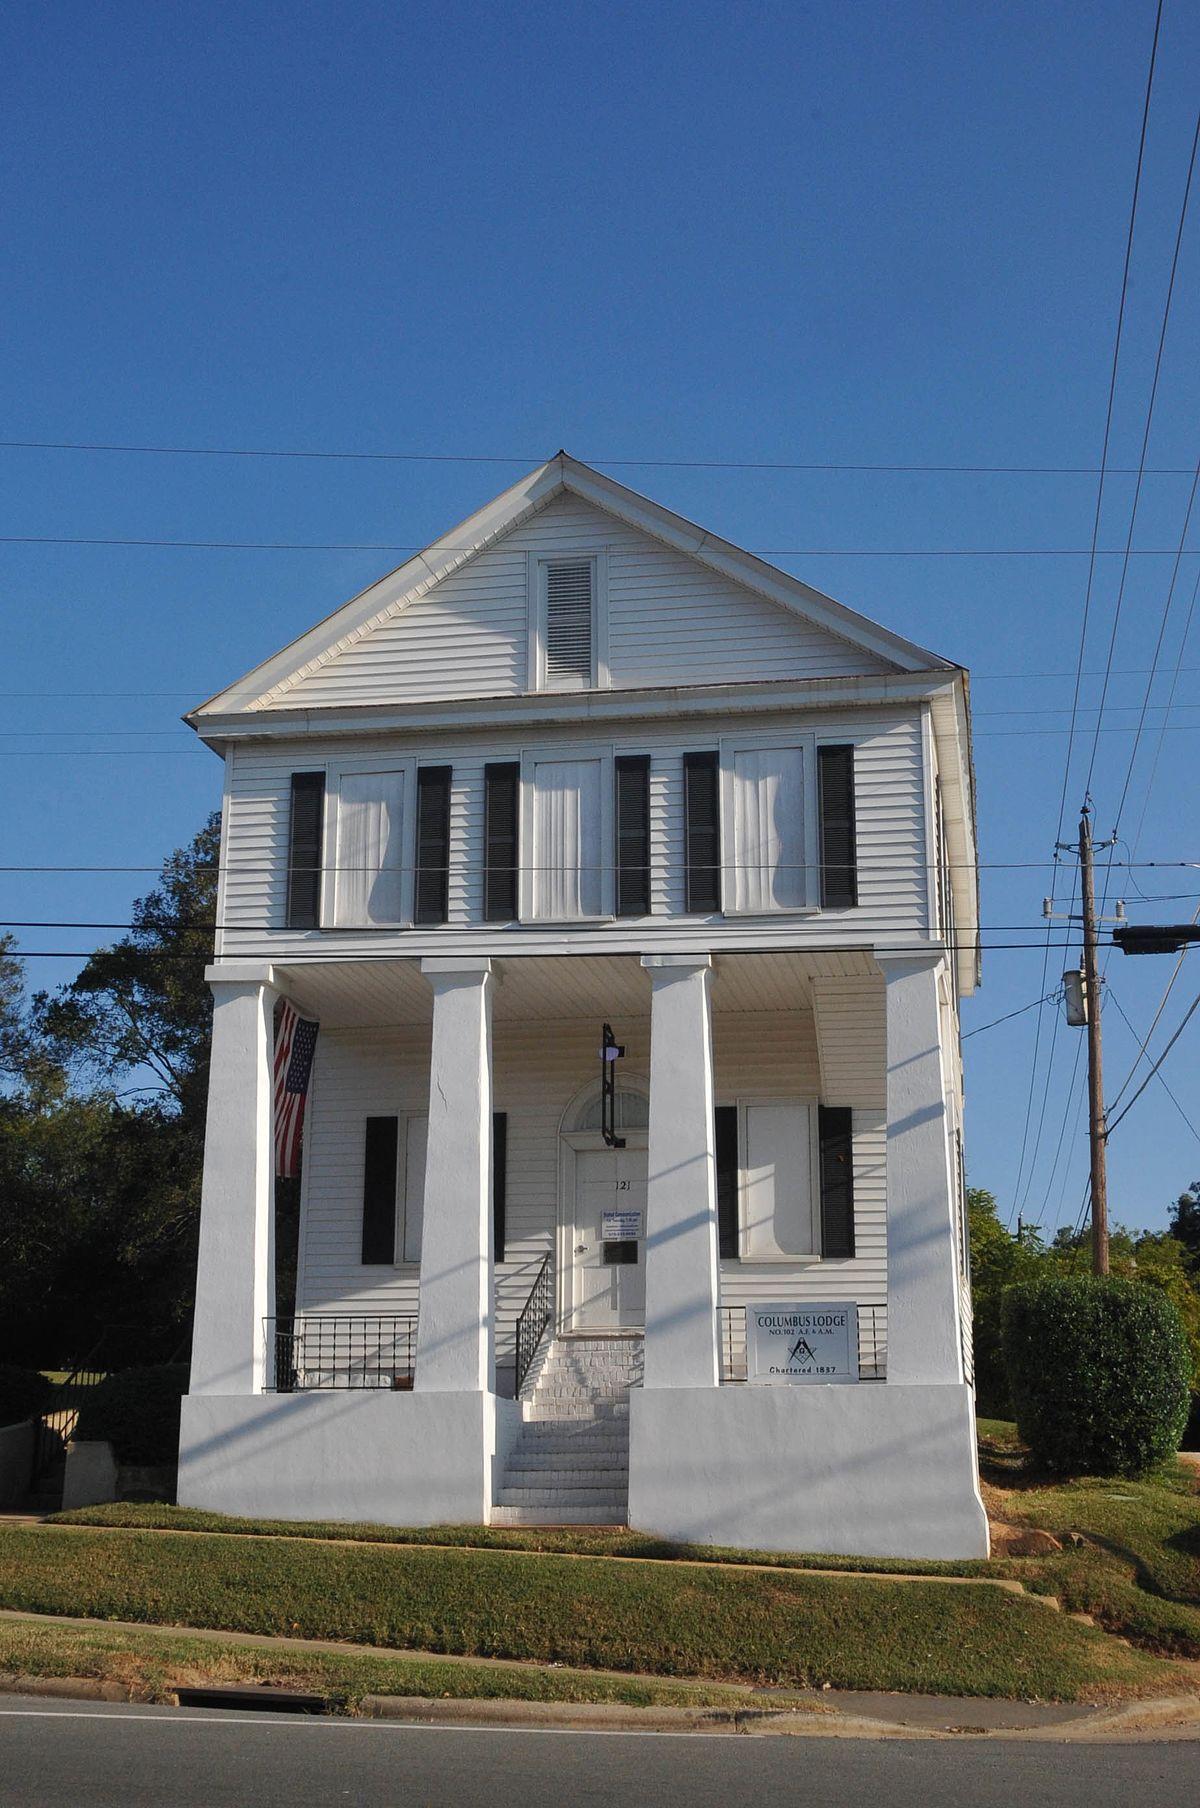 The Lodge At Bryce Canyon Dining Room: Pittsboro Masonic Lodge